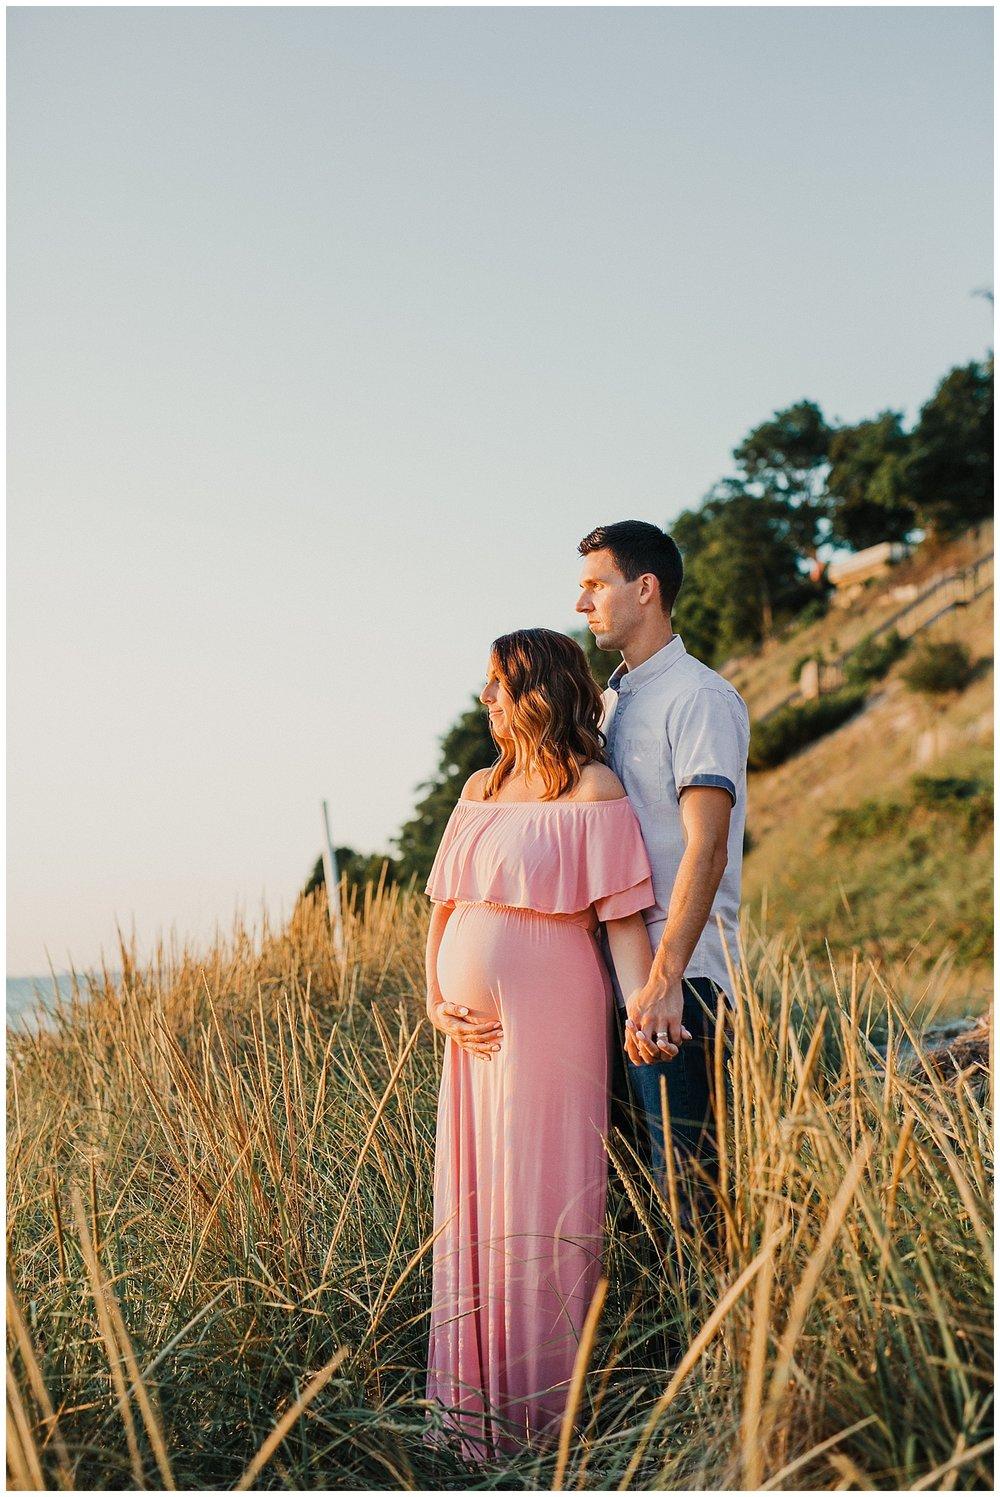 lindybeth photography - maternity - keith malyn-115.jpg